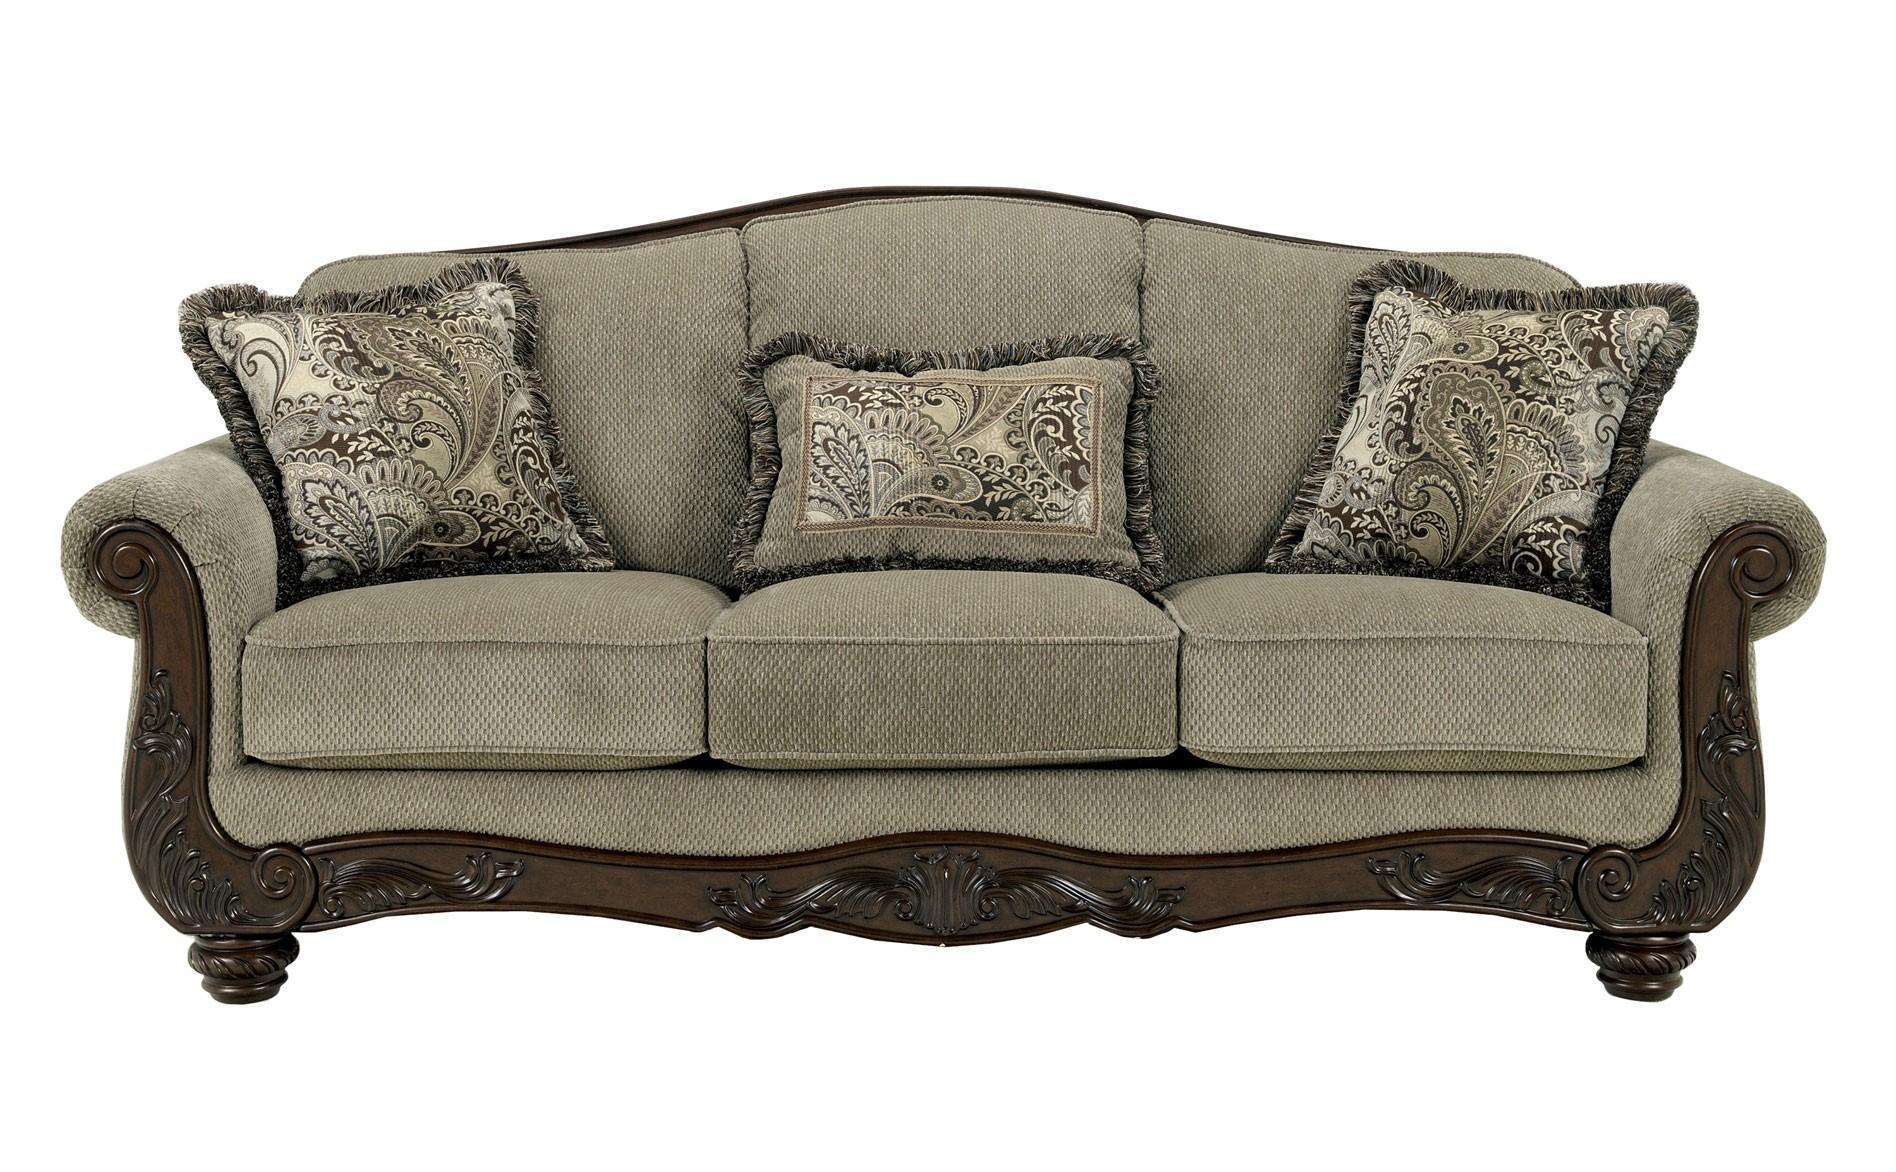 Ashley Furniture Bradington Truffle Sofa Pieratt S Appliances For With Bradington Truffle Sofas (Image 4 of 20)